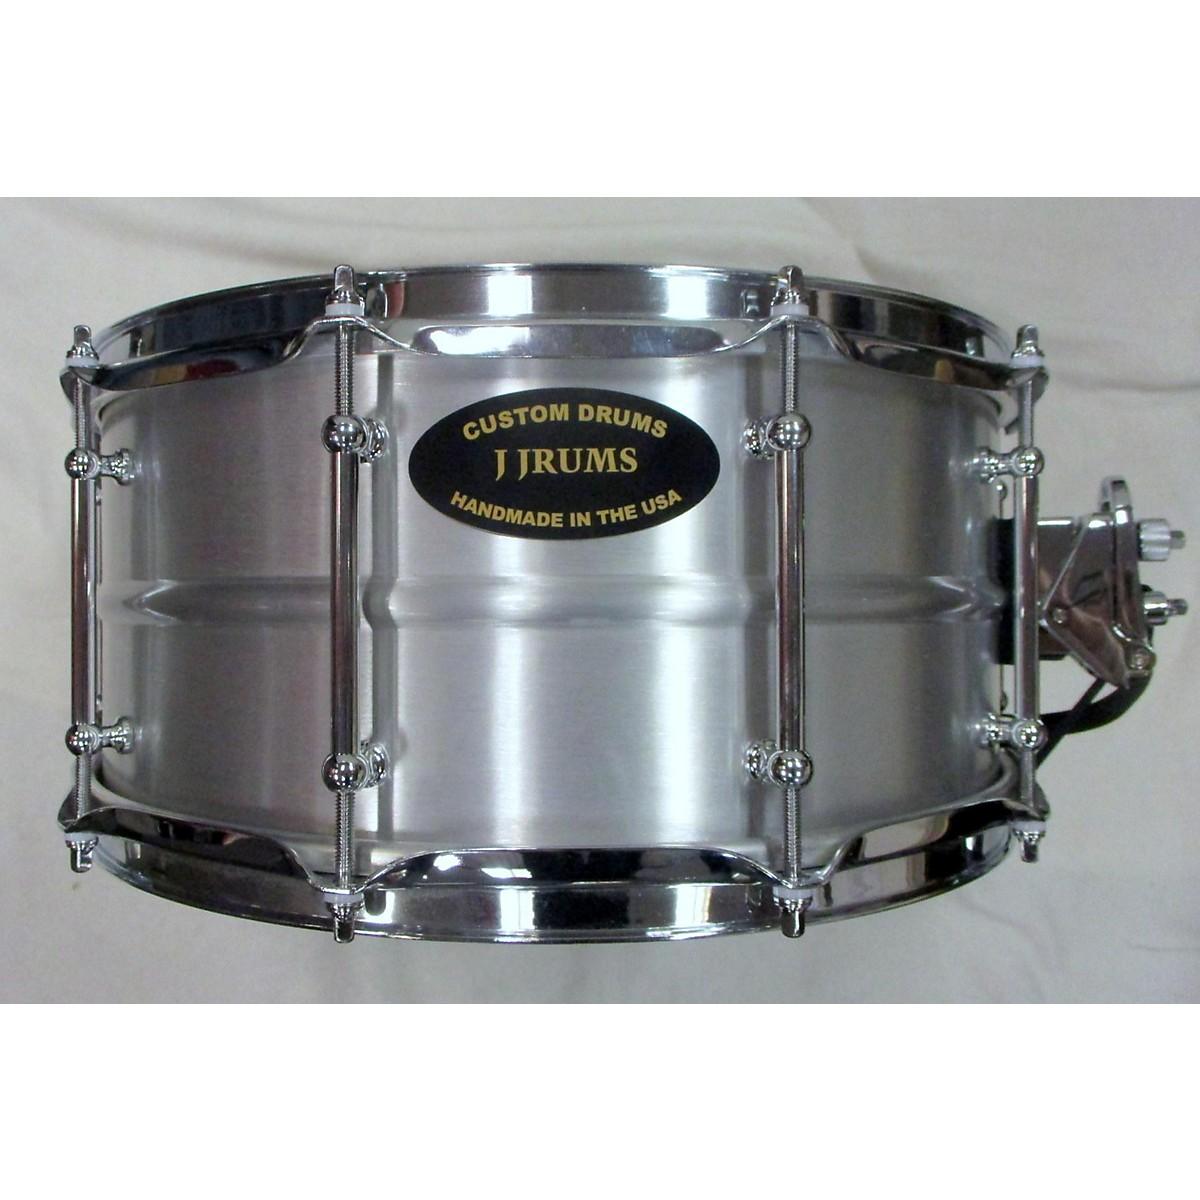 In Store Used Used J Drums Custom Drums 6.5X14 Seamless Aluminum Drum Natural